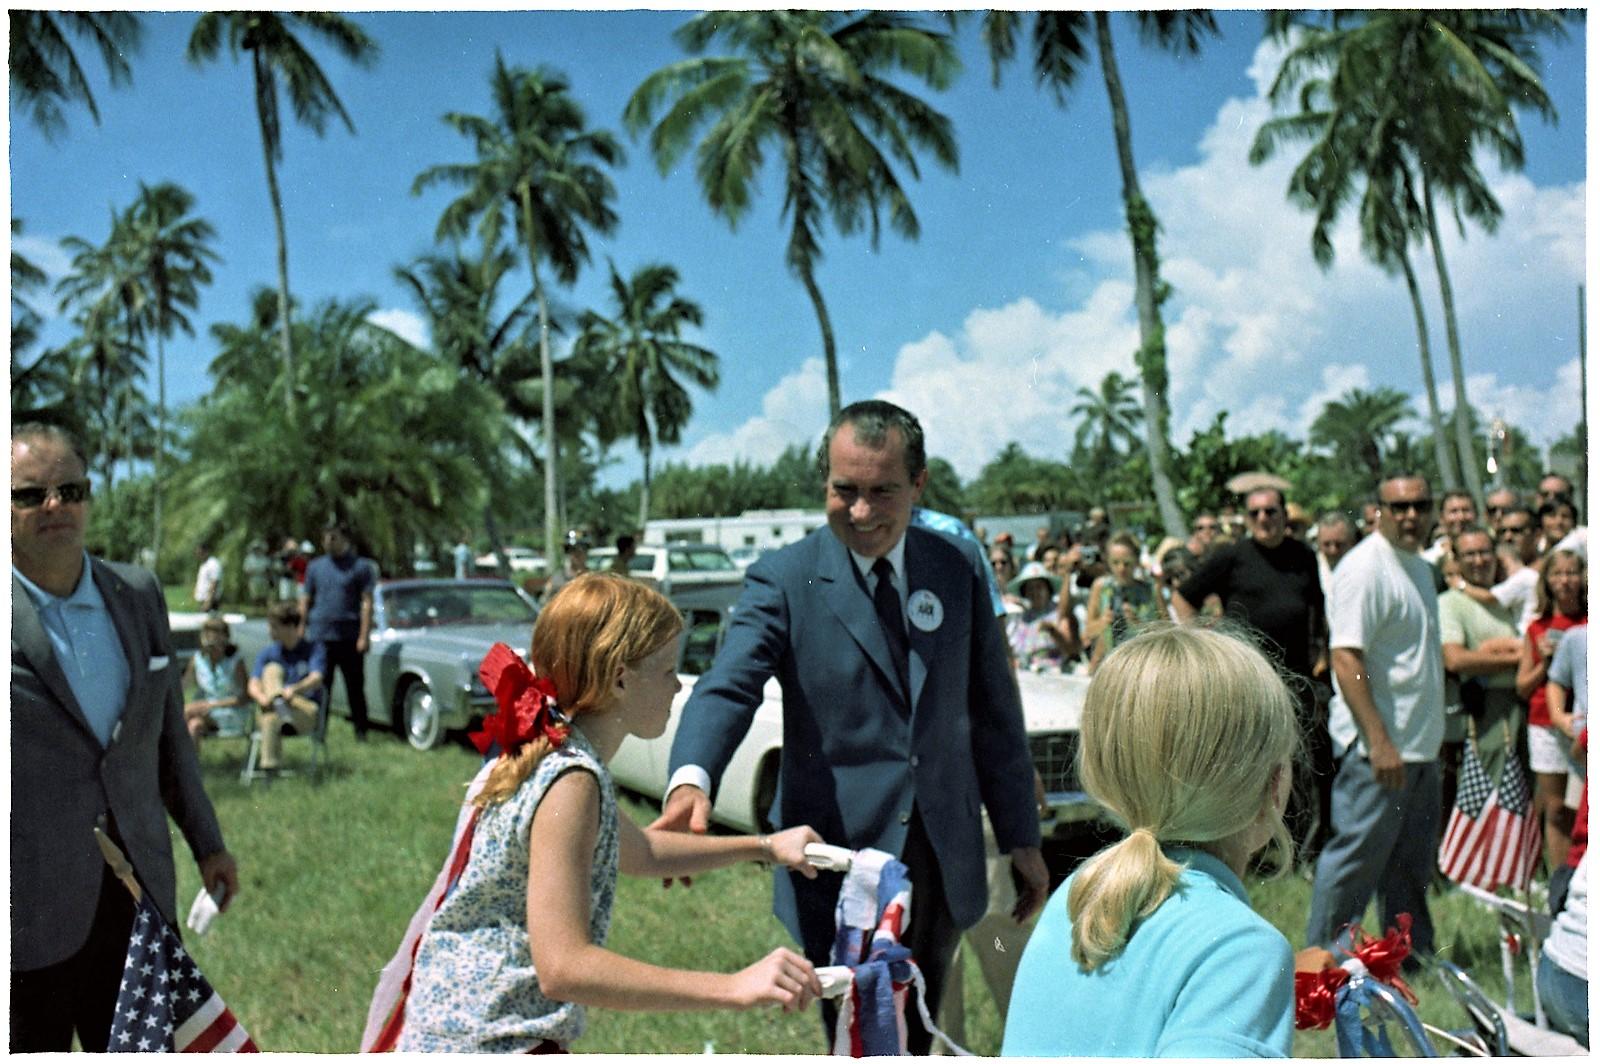 president-nixon-greeting-children-on-the-crandon-boulevard-fourth-of-july-parade-9d4ede-1600.jpg